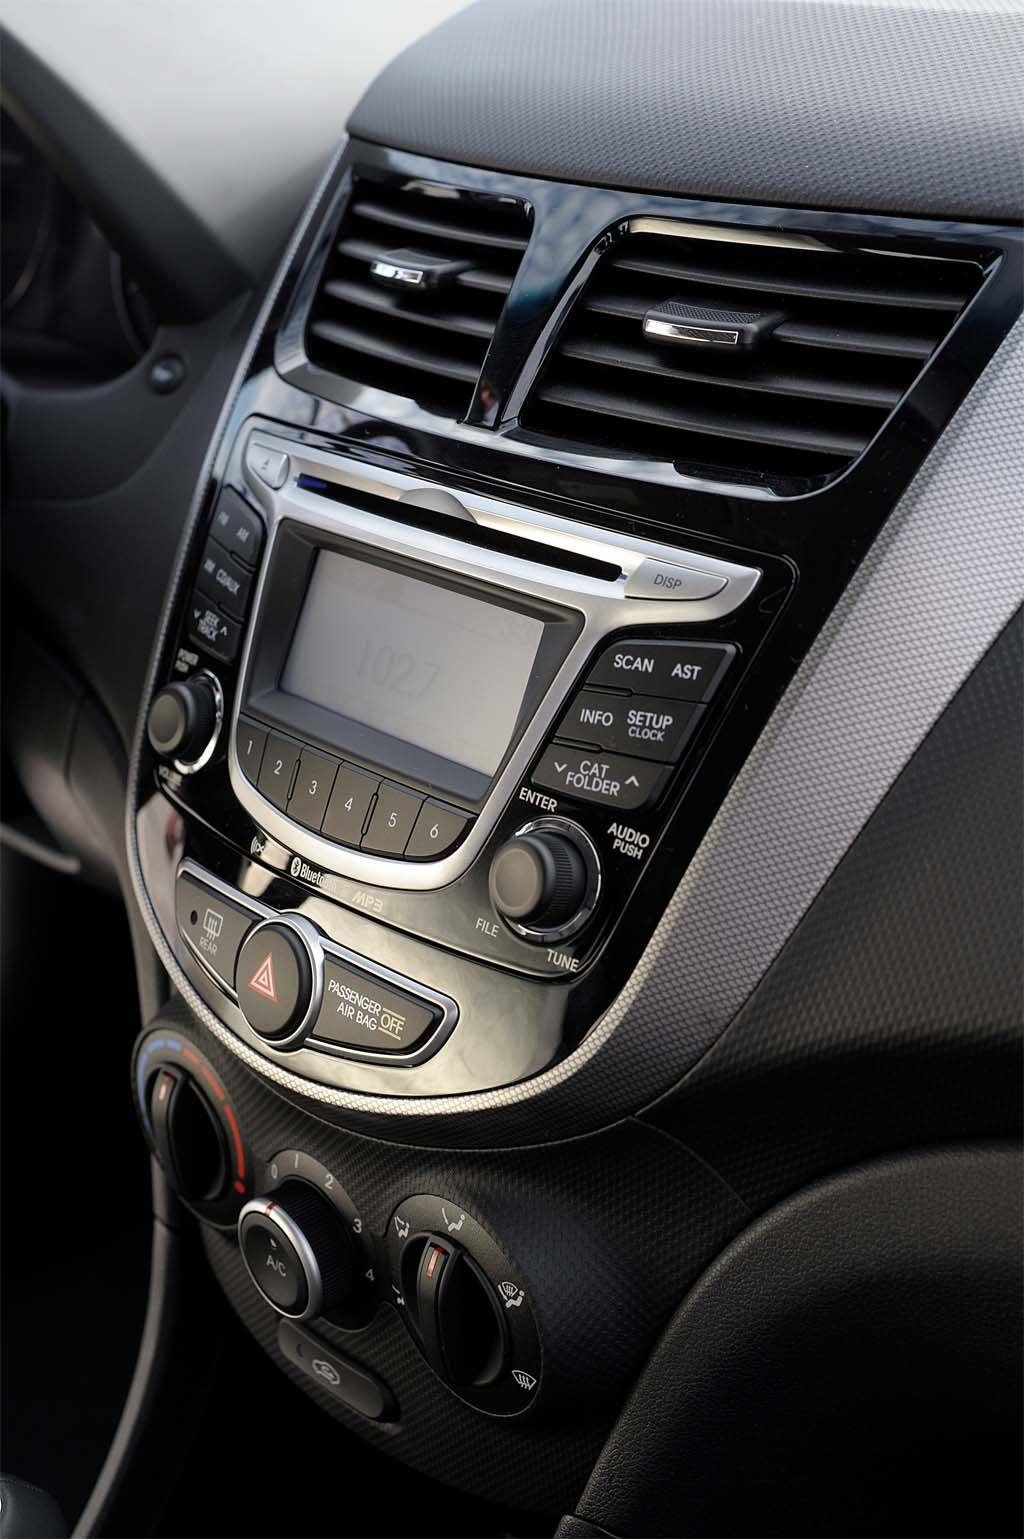 Hyundai Accent Mpg >> First Drive: 2012 Hyundai Accent | TheDetroitBureau.com